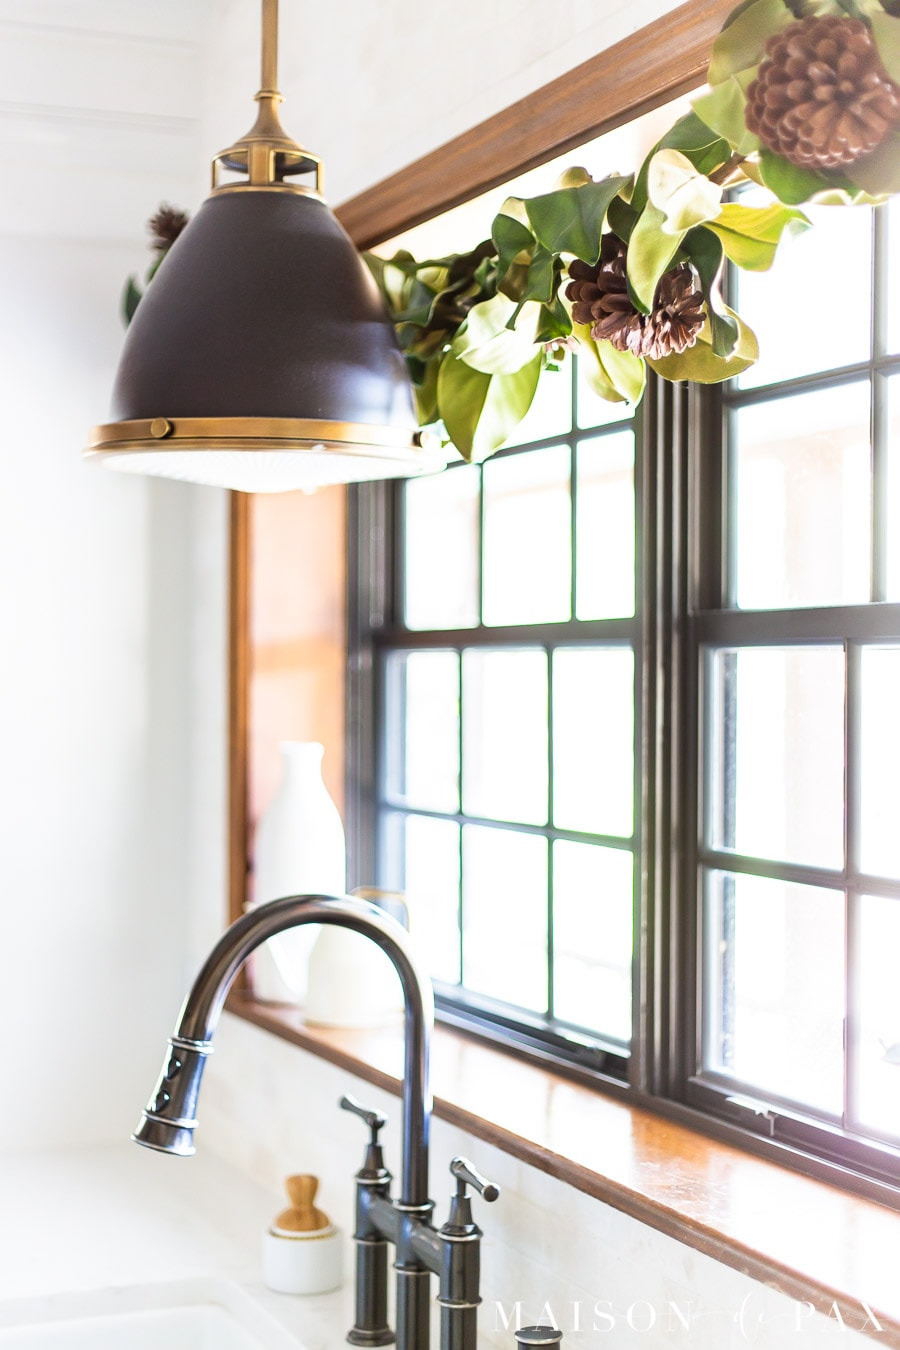 magnolia leaf garland and pendant light over farm sink | Maison de Pax